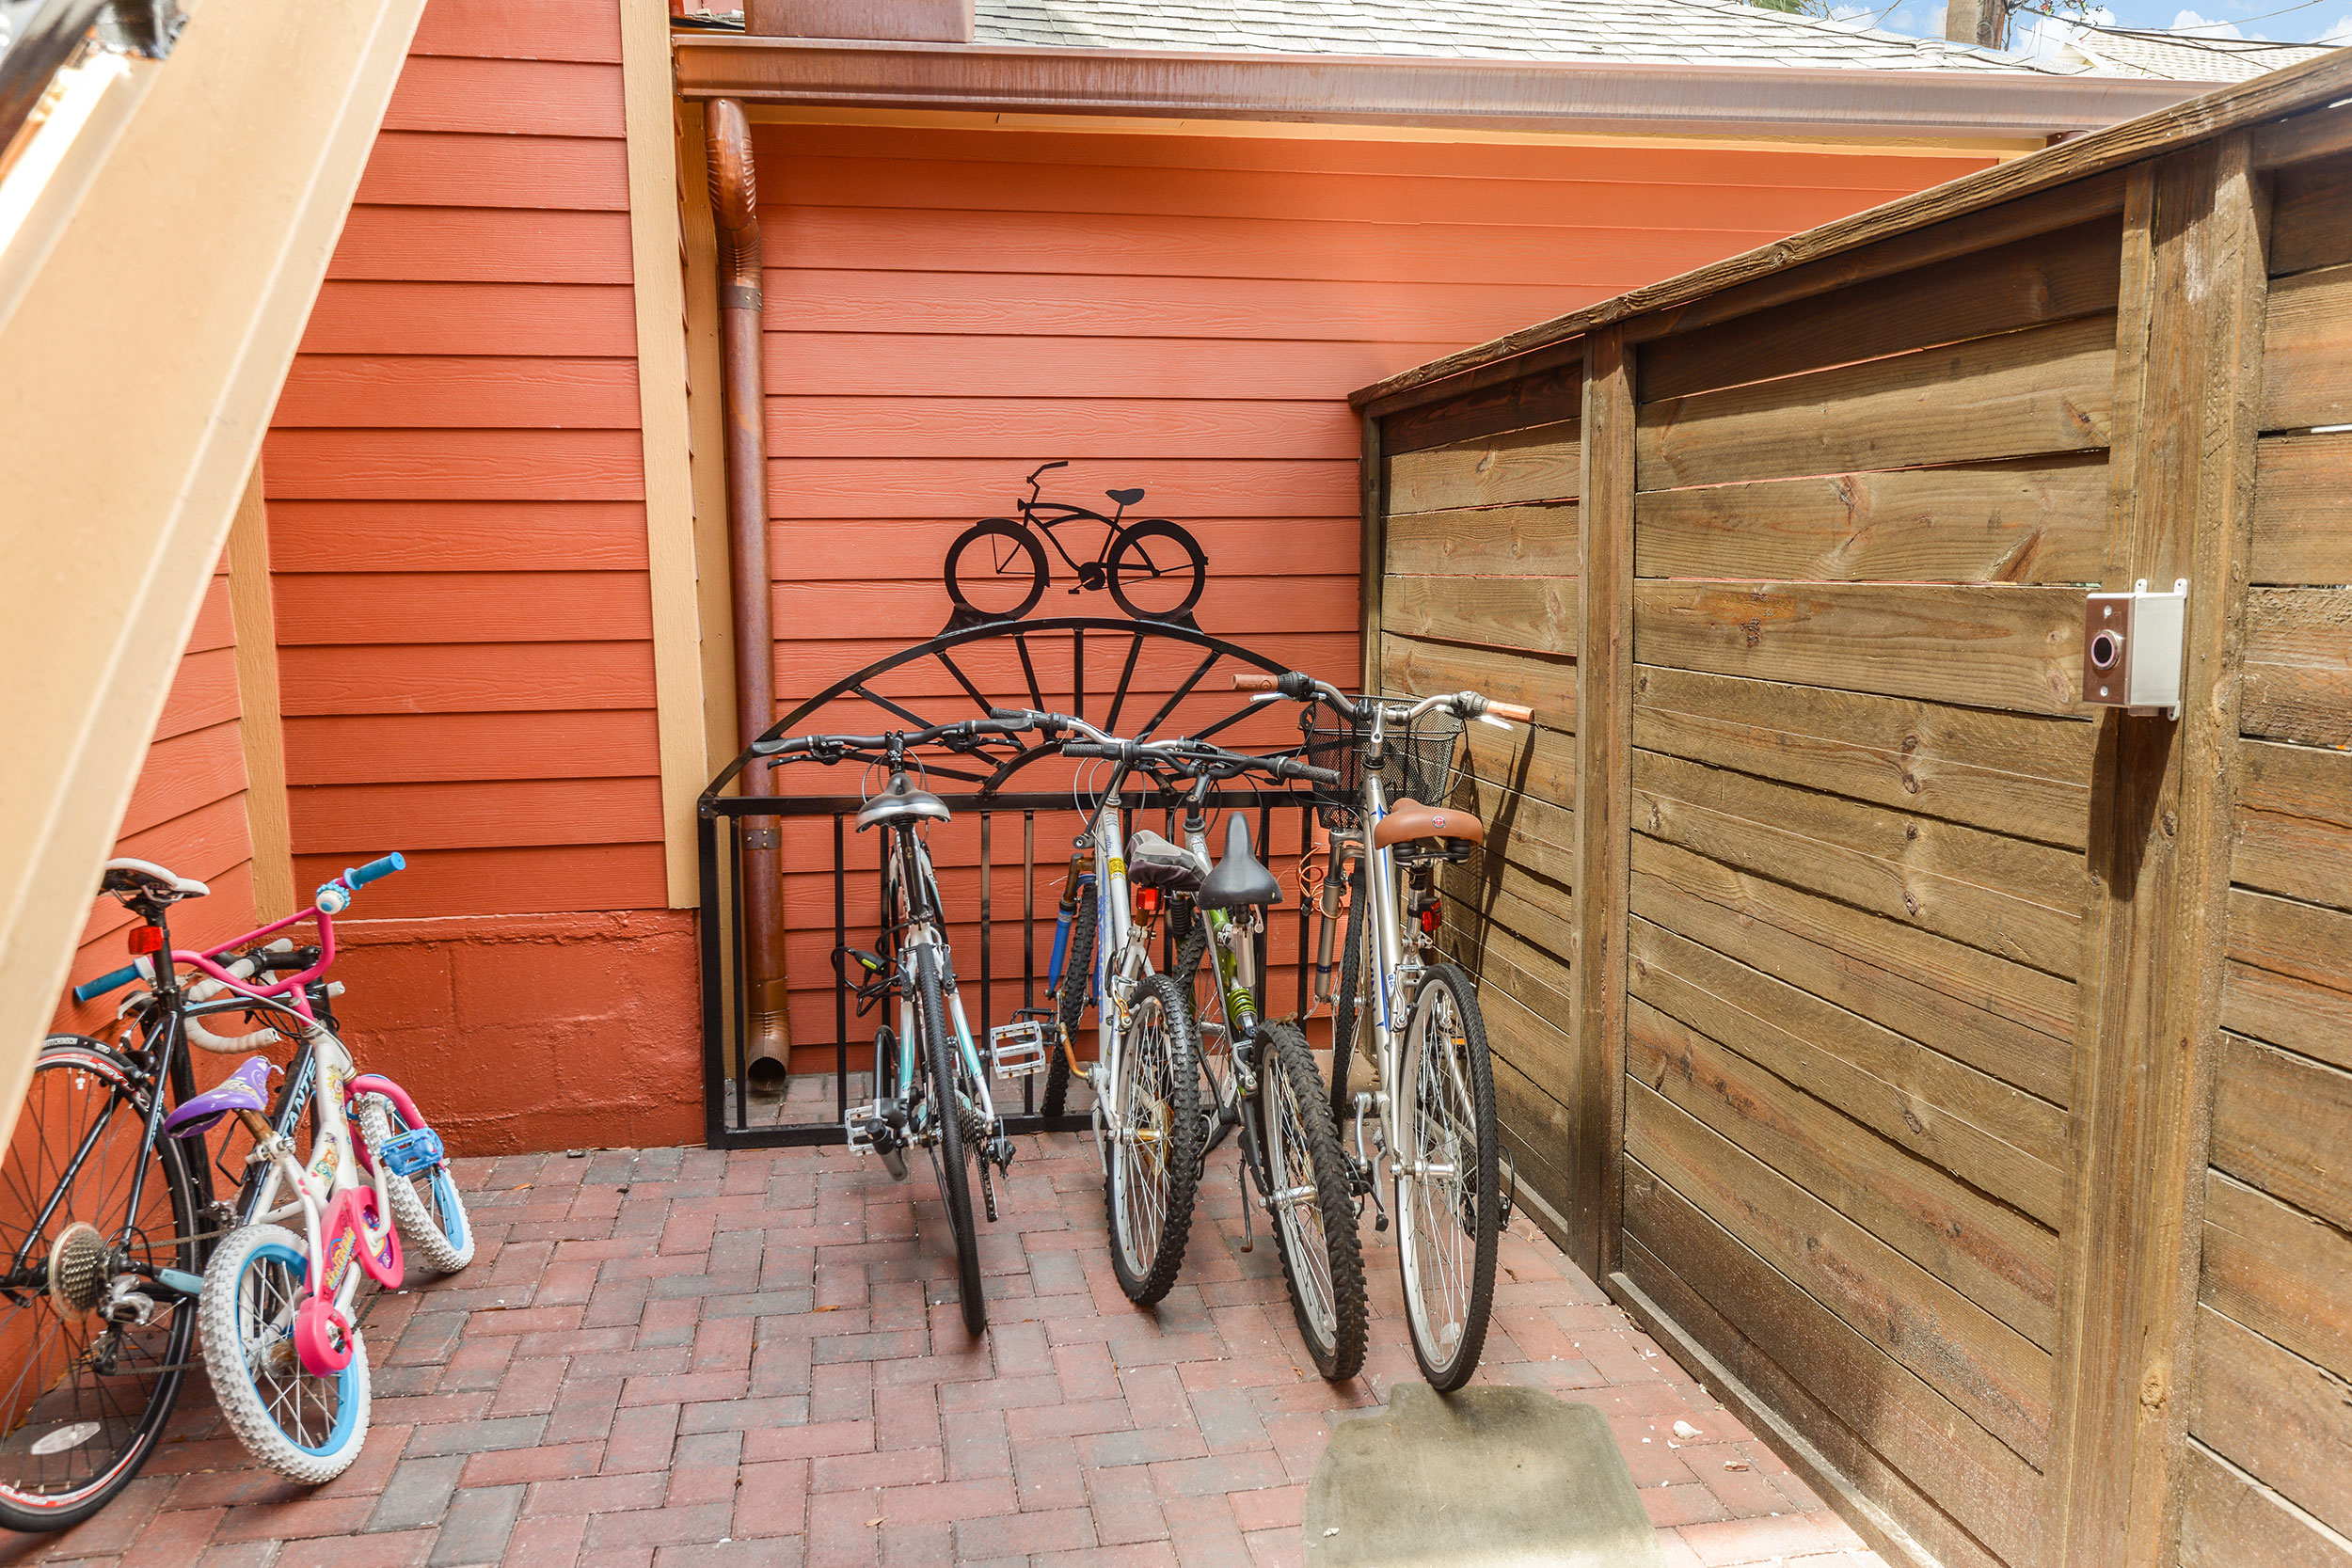 Del-amen-bike-rack